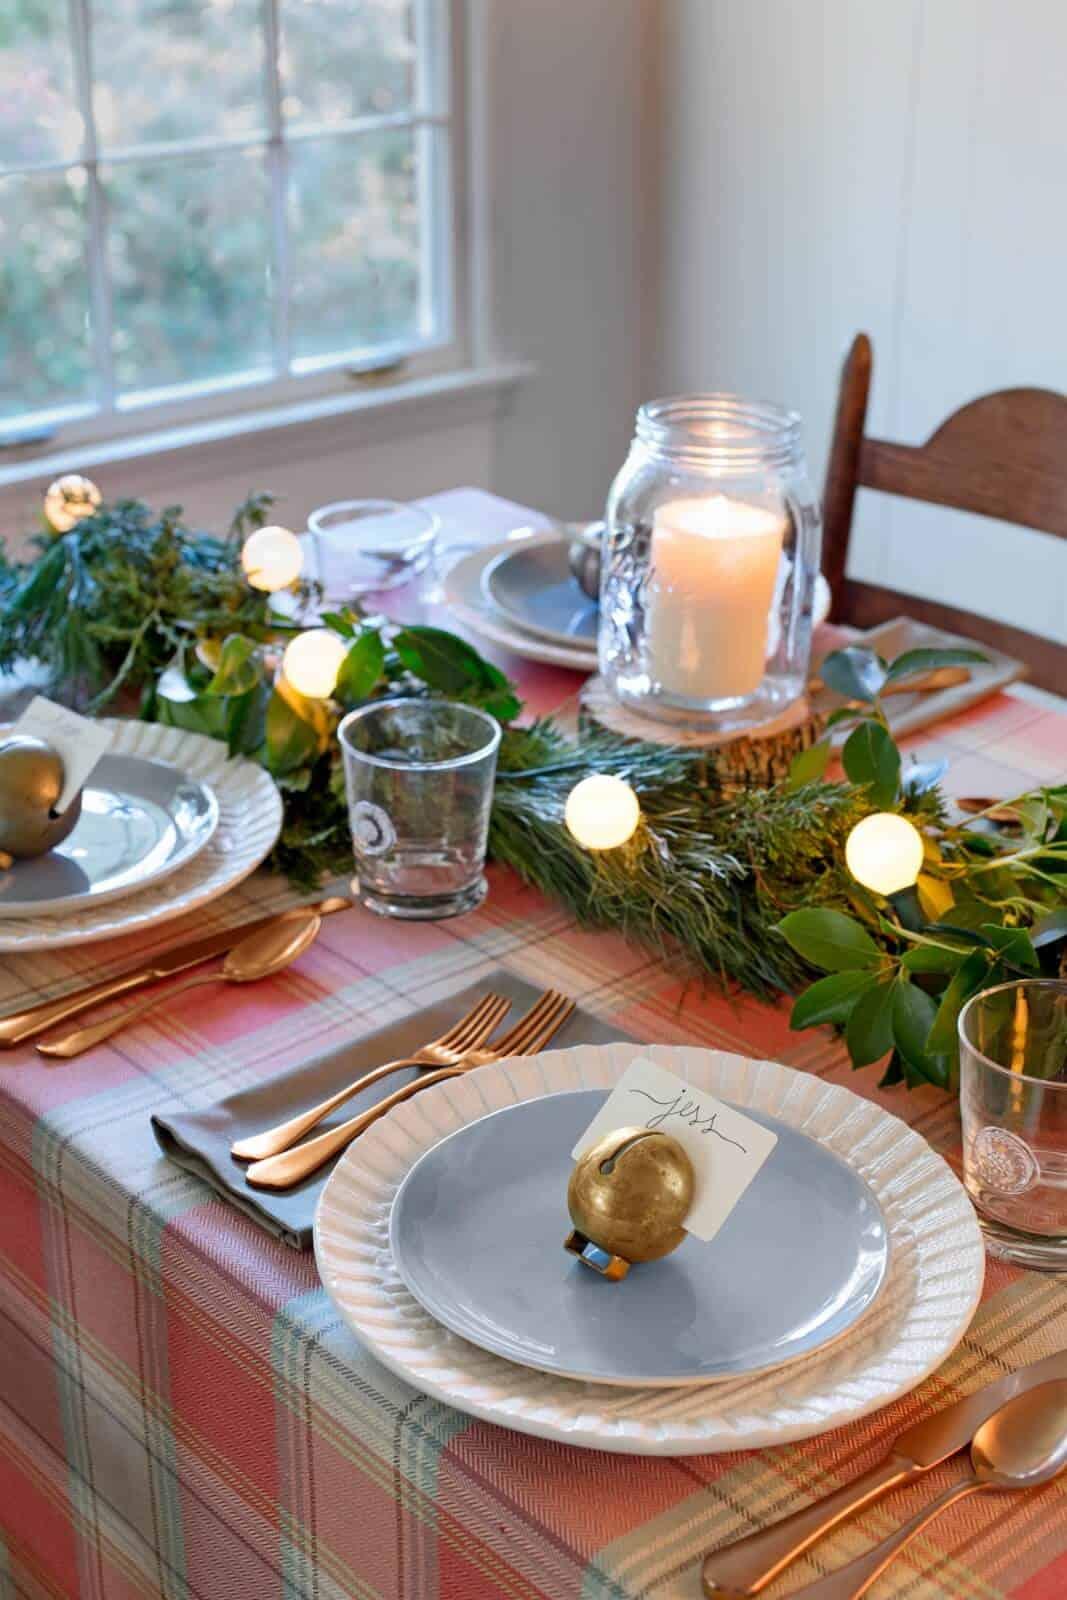 Plain and greenery seasonal table